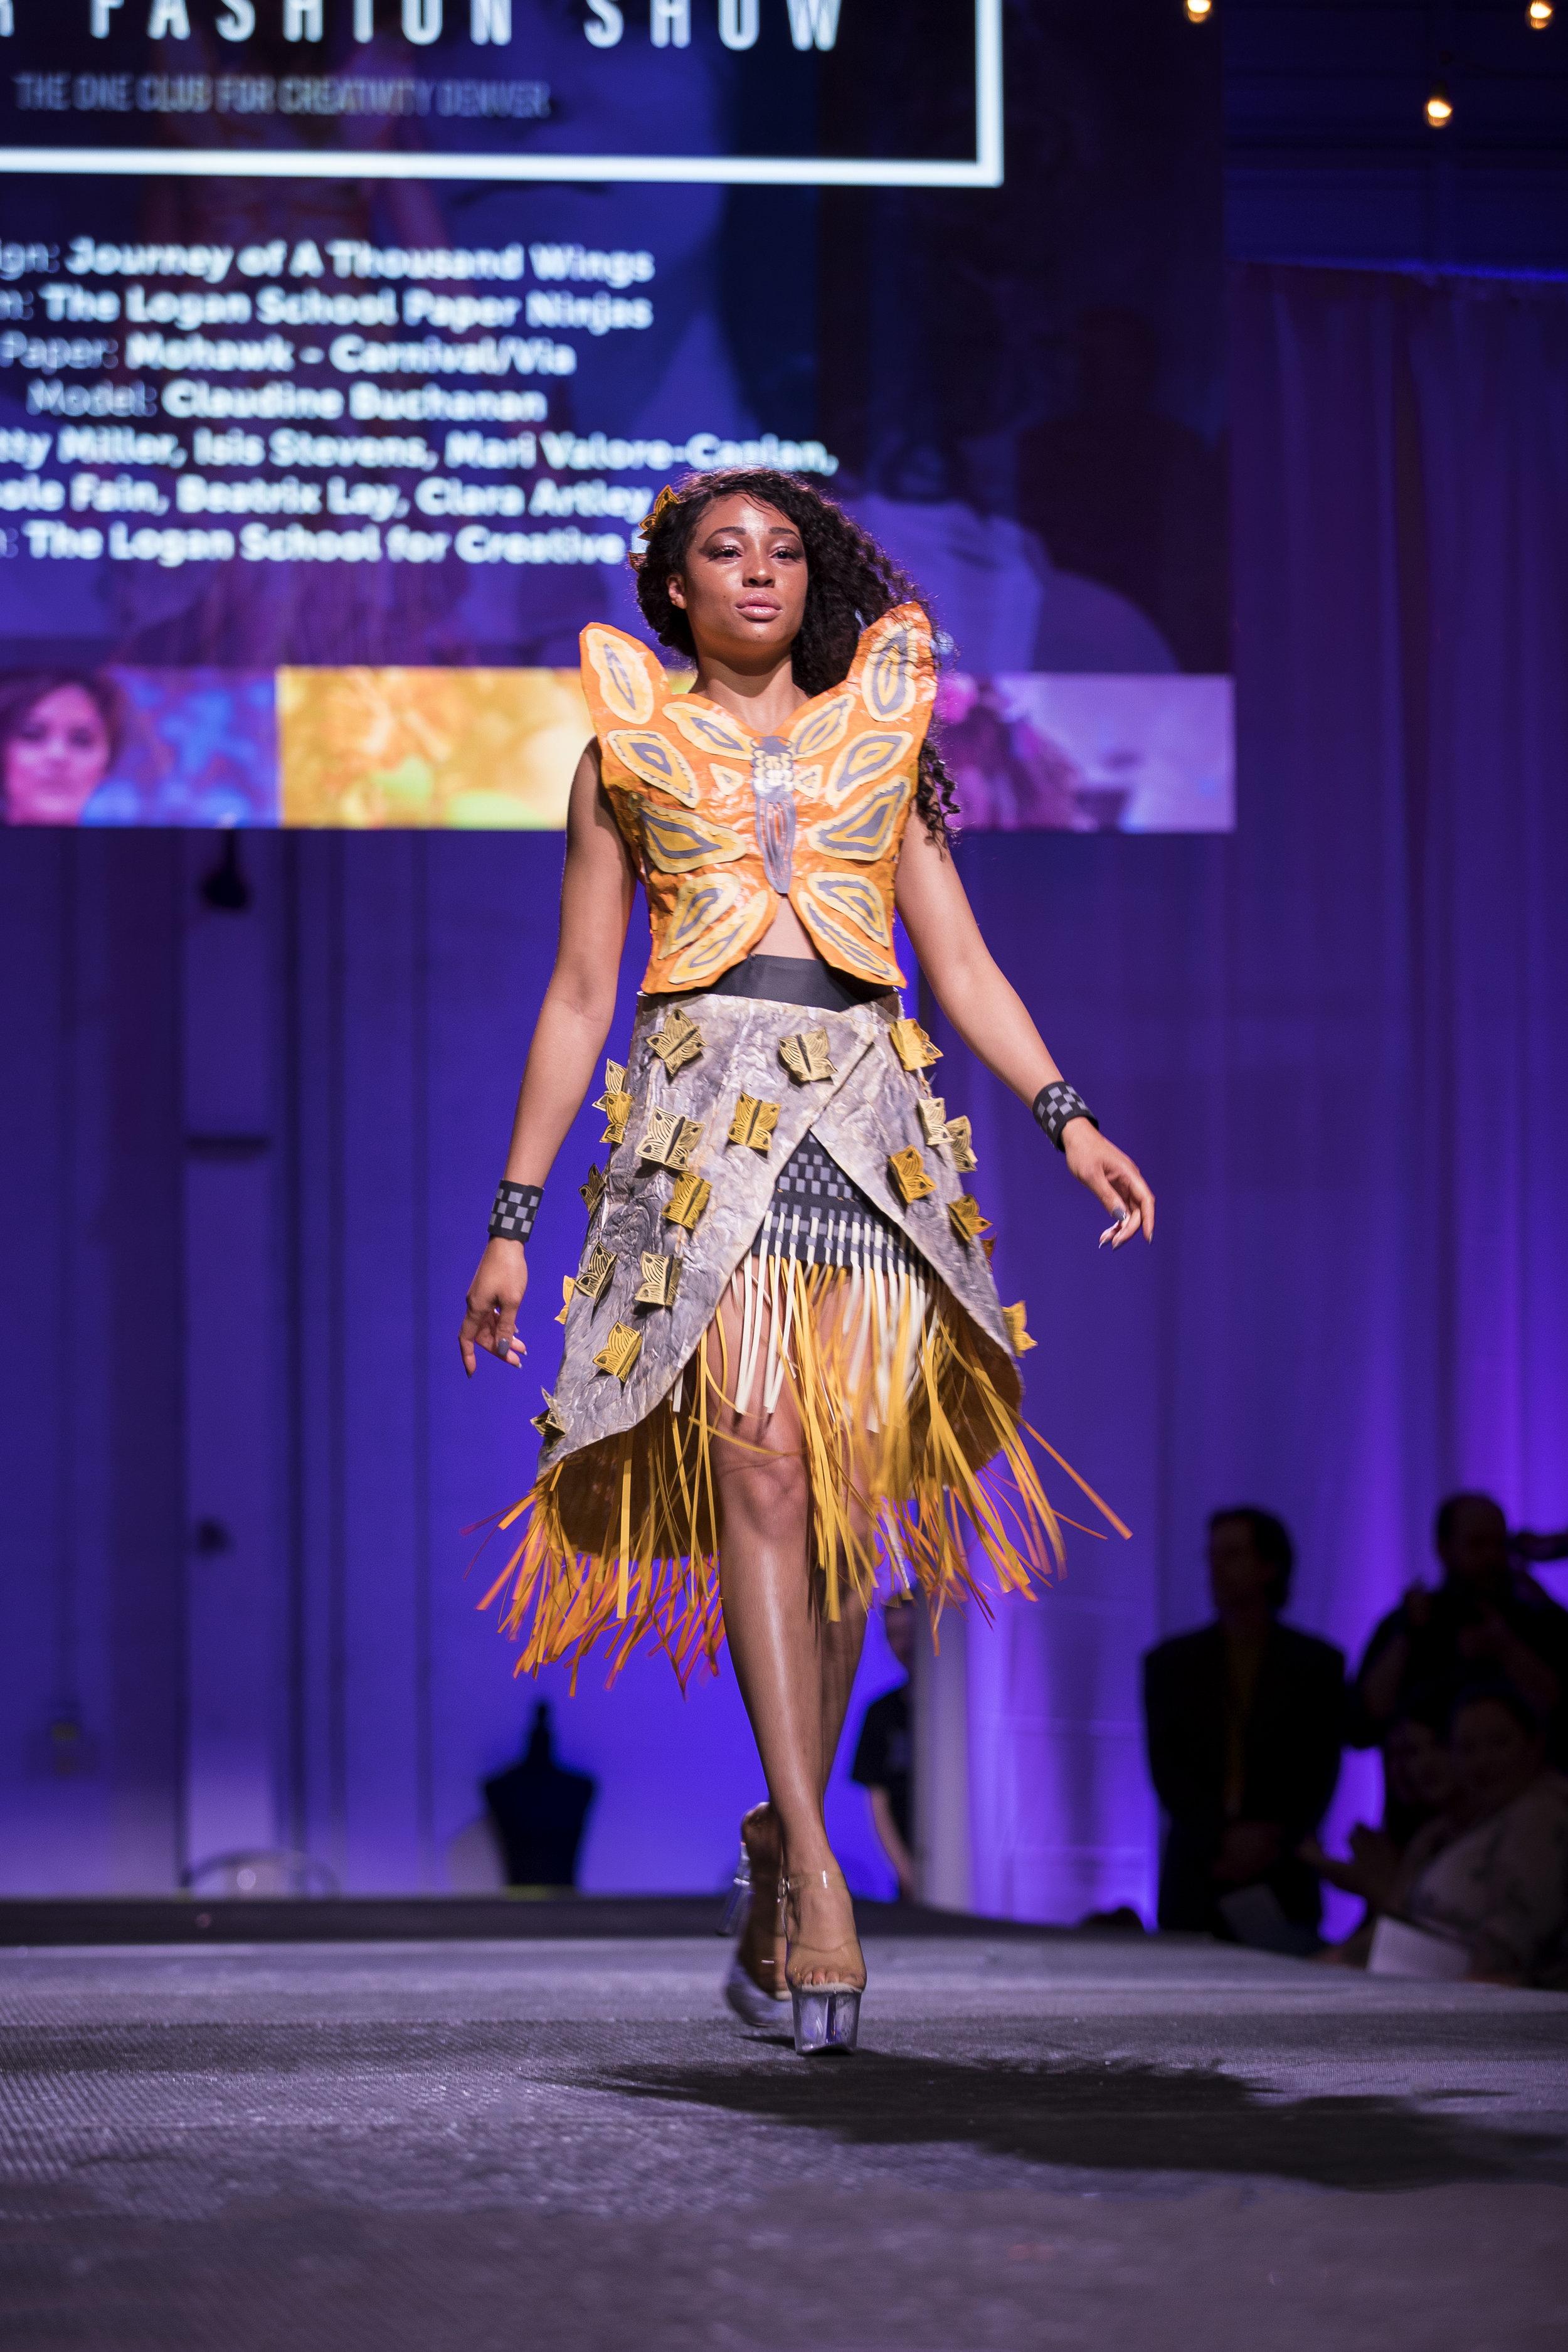 Paper Fashion Show 2019 - 061.jpg